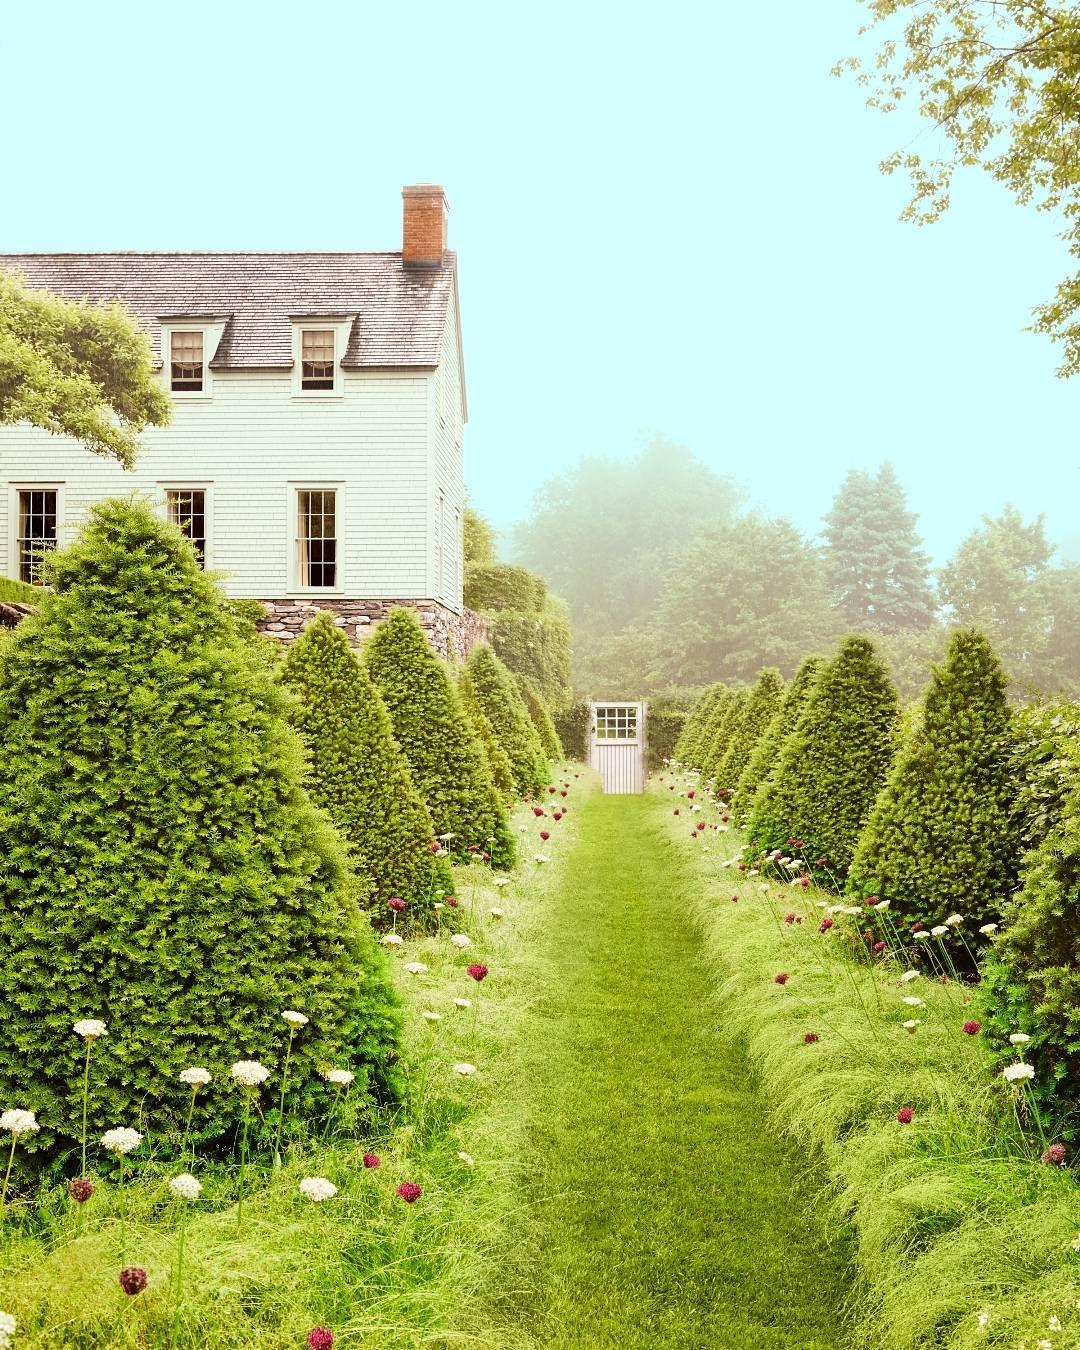 Landscape Architects: Photo: @maxkimbee, Architecture